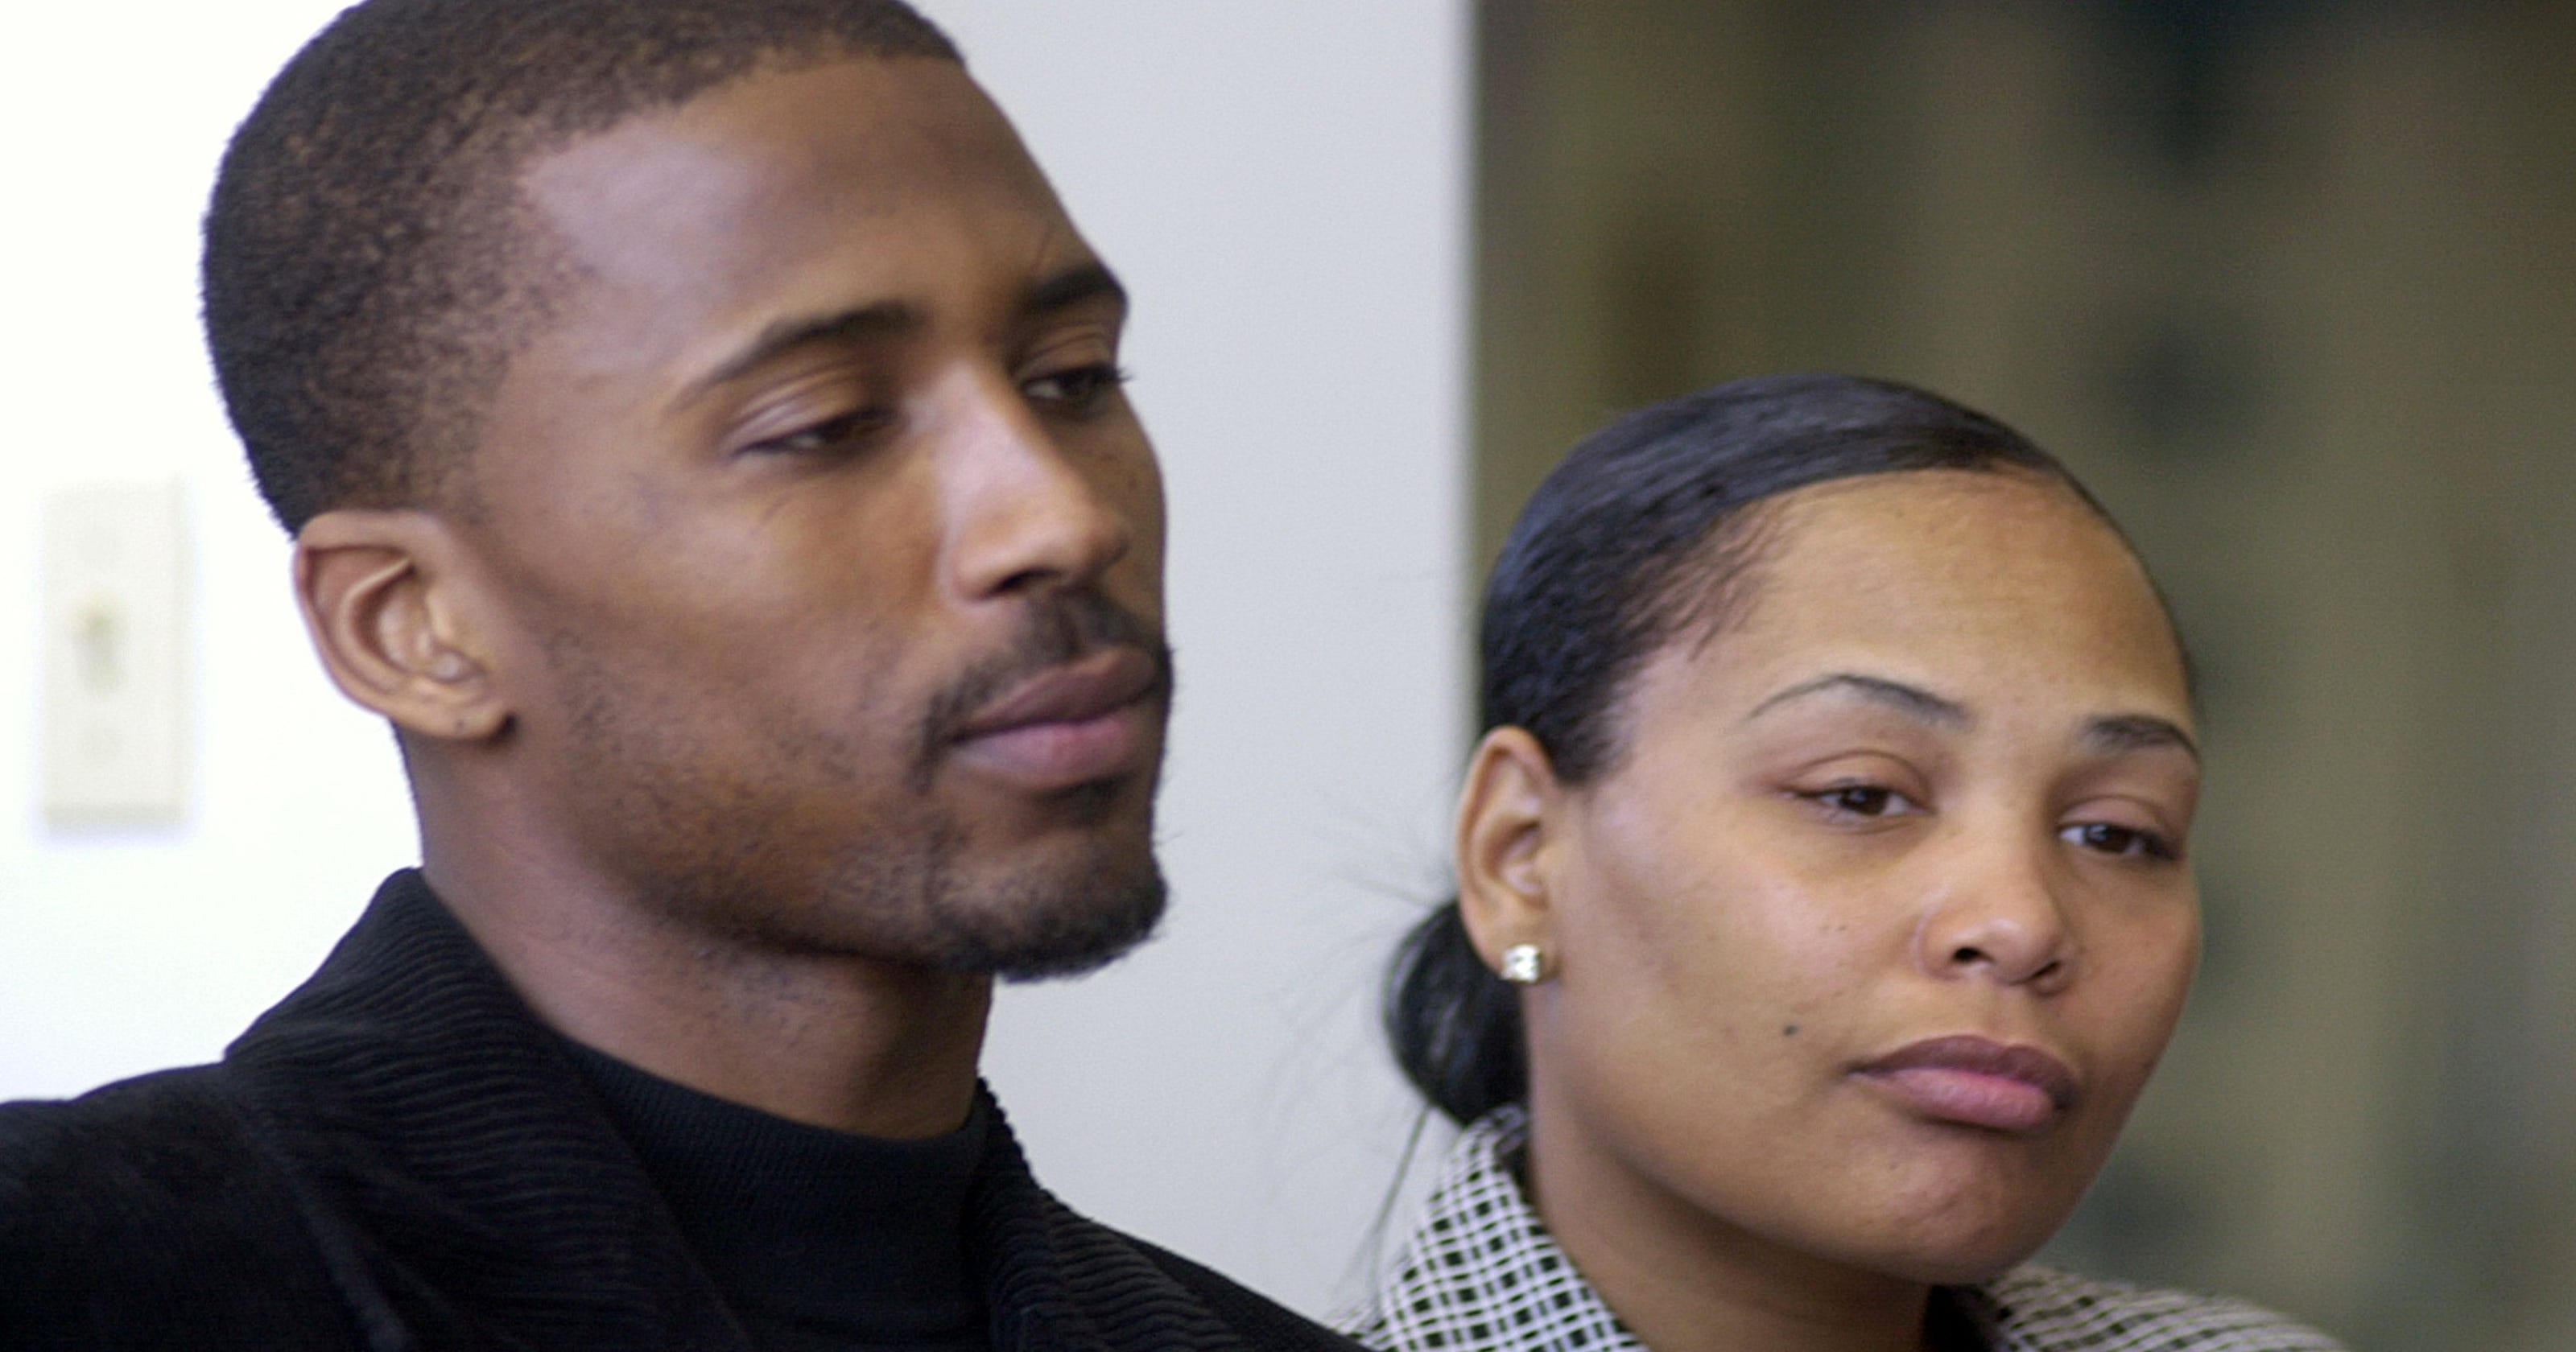 Lorenzen Wright's ex-wife Sherra arrested in California